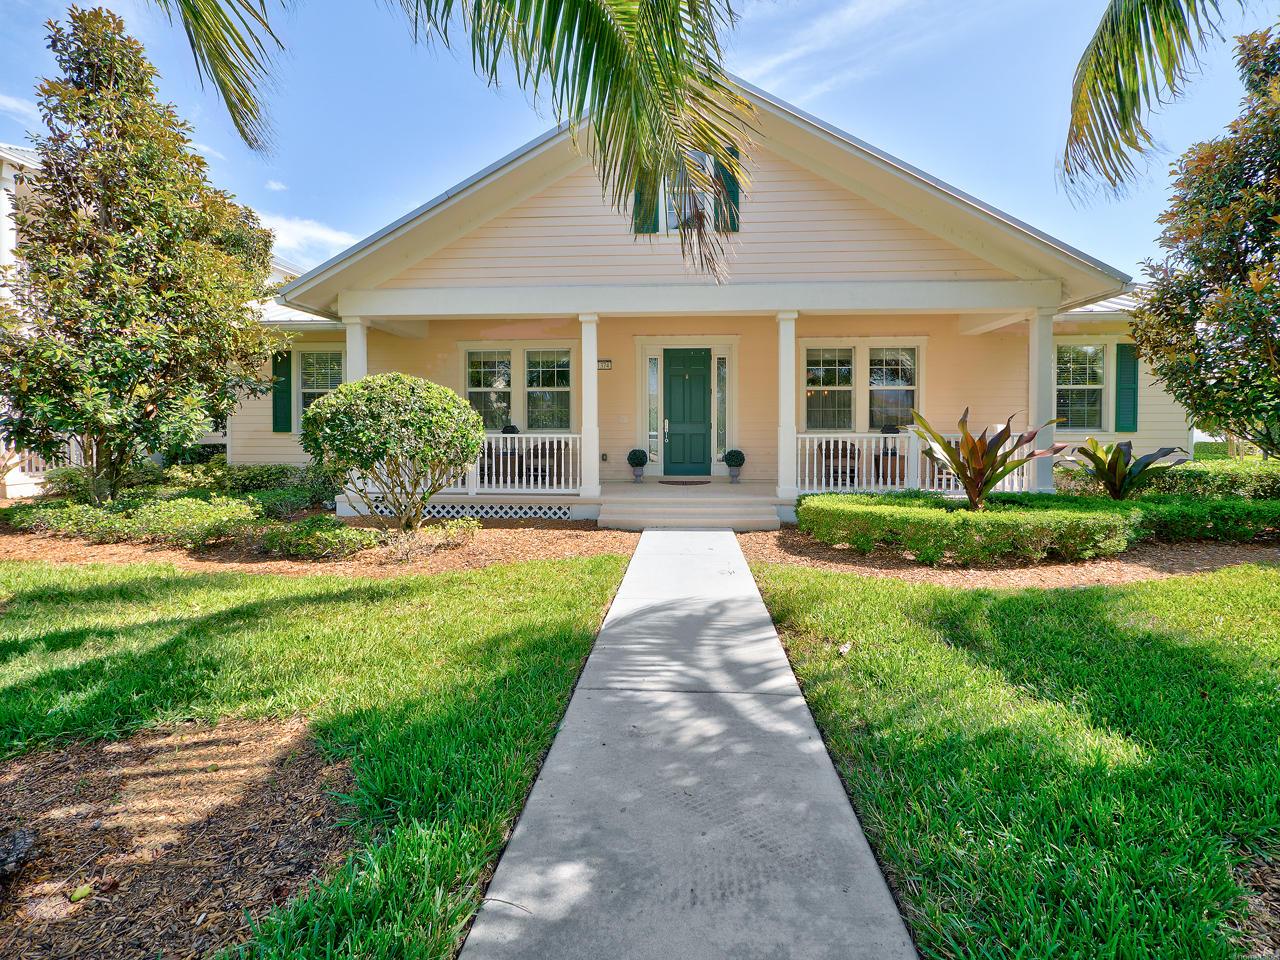 1374 Dakota Drive, Jupiter, Florida 33458, 5 Bedrooms Bedrooms, ,4 BathroomsBathrooms,A,Single family,Dakota,RX-10500683